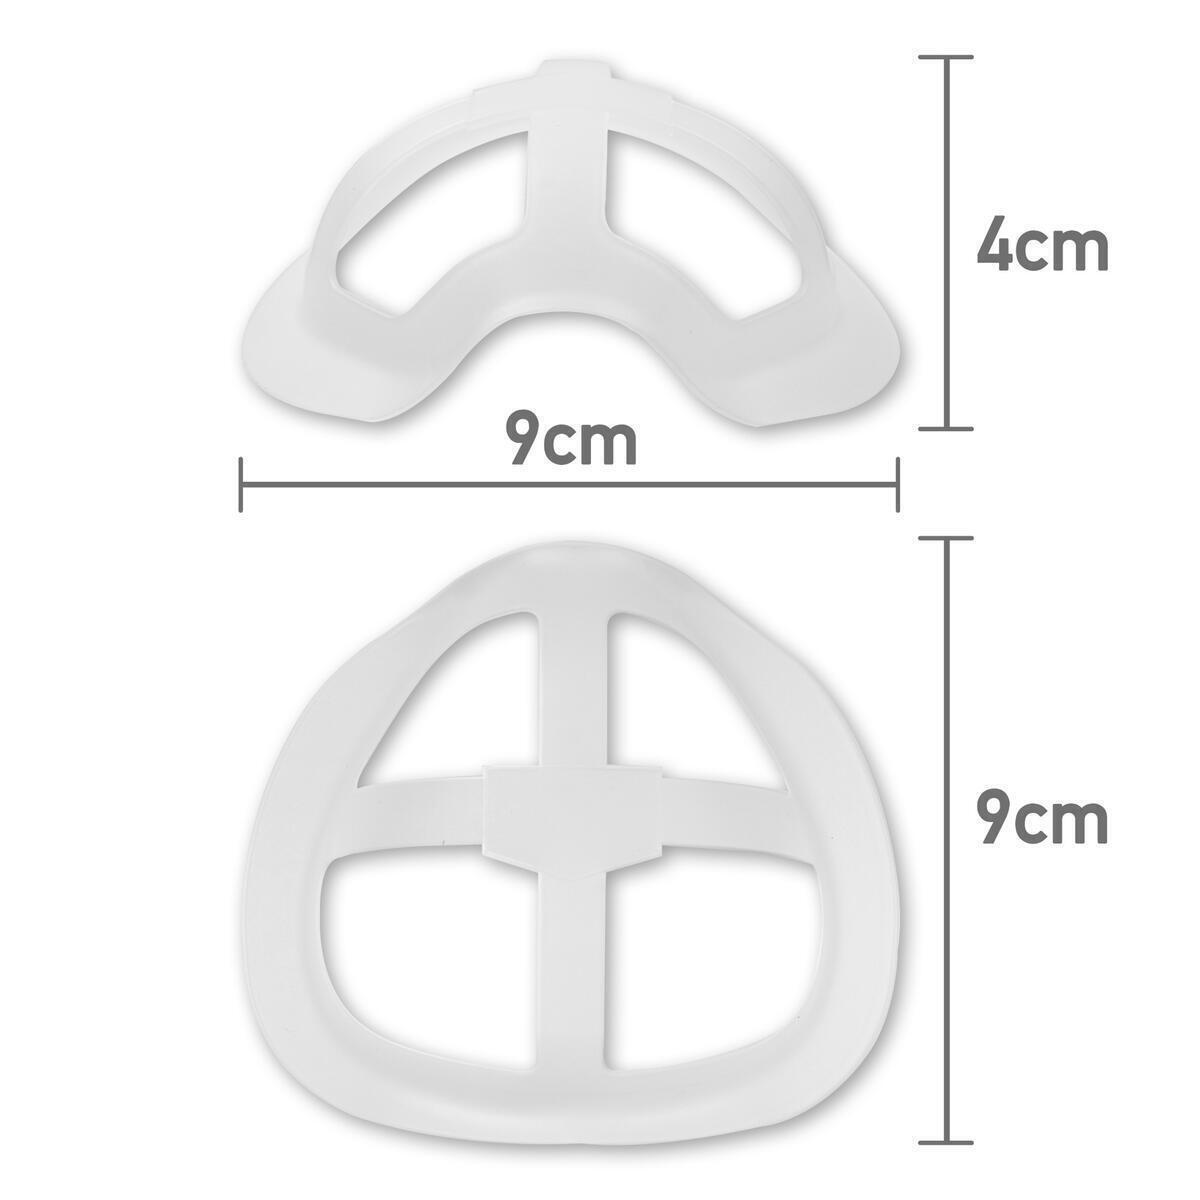 Adult 3D Face Mask Bracket – Inner Support Frame for Cloth Masks – Large – 10 Pack – Lipstick Protection – No Fog Glasses Protection – Reusable – Clear – SafeLux